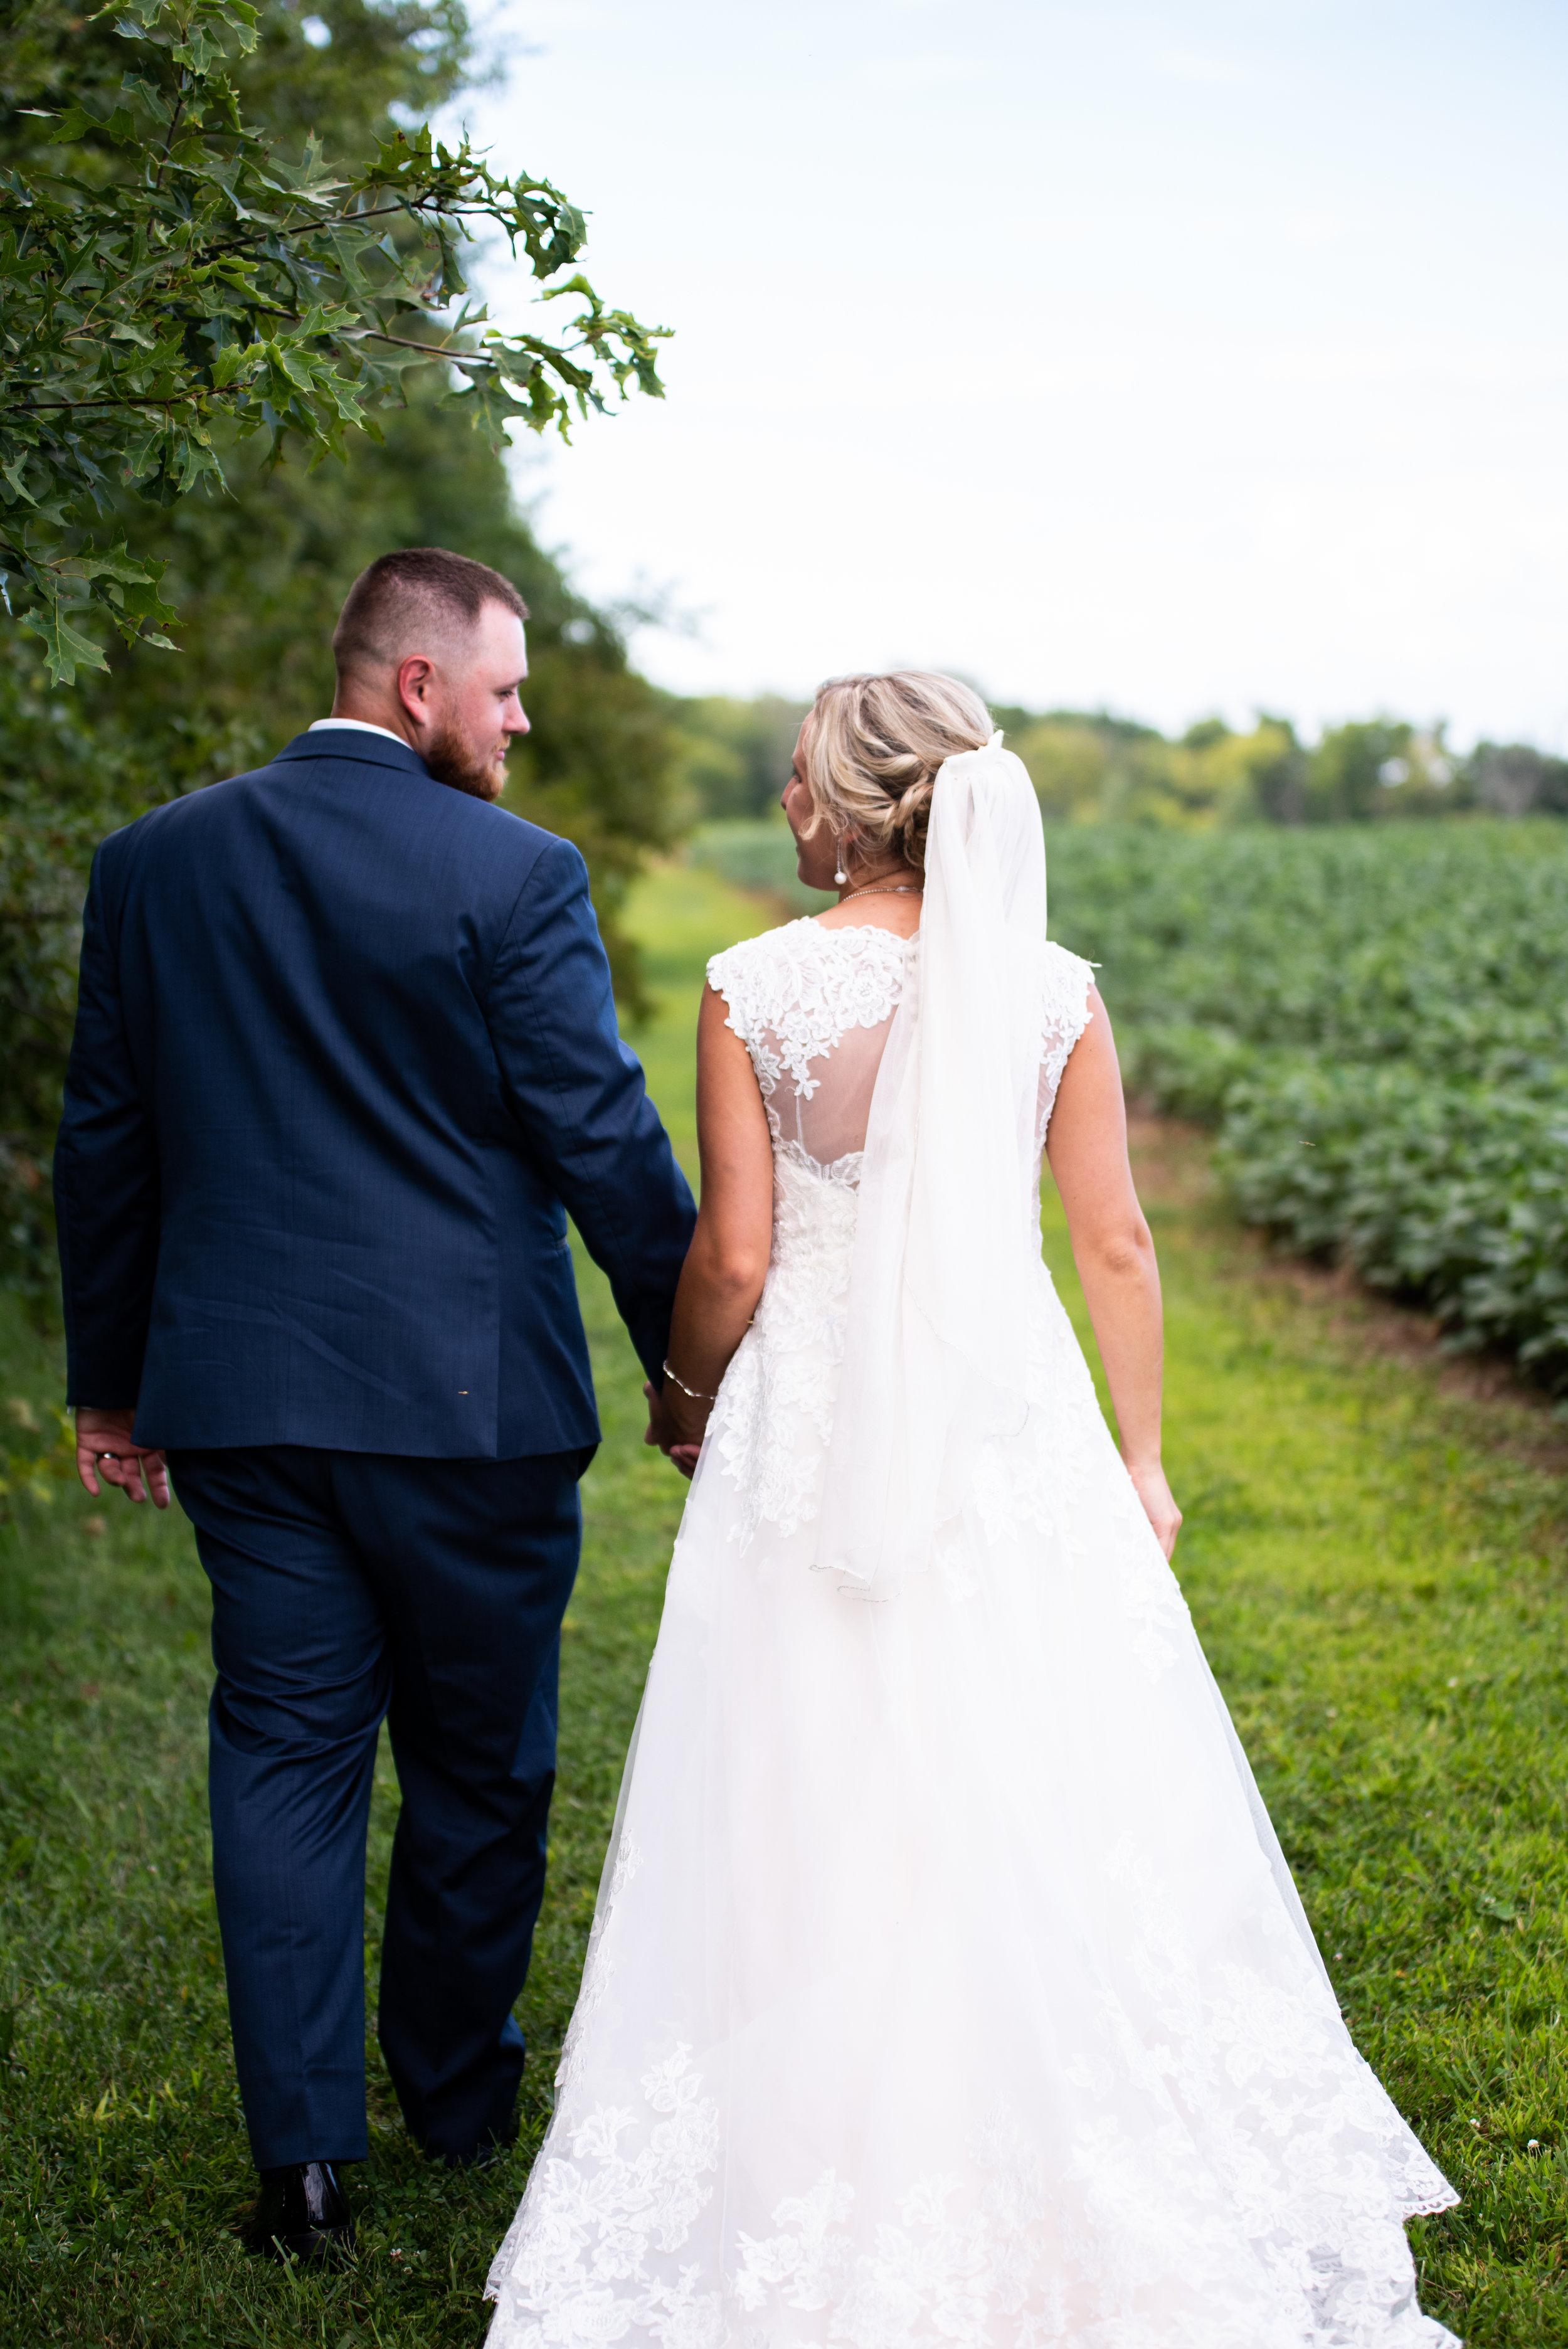 wedding (1 of 1)-184.jpg